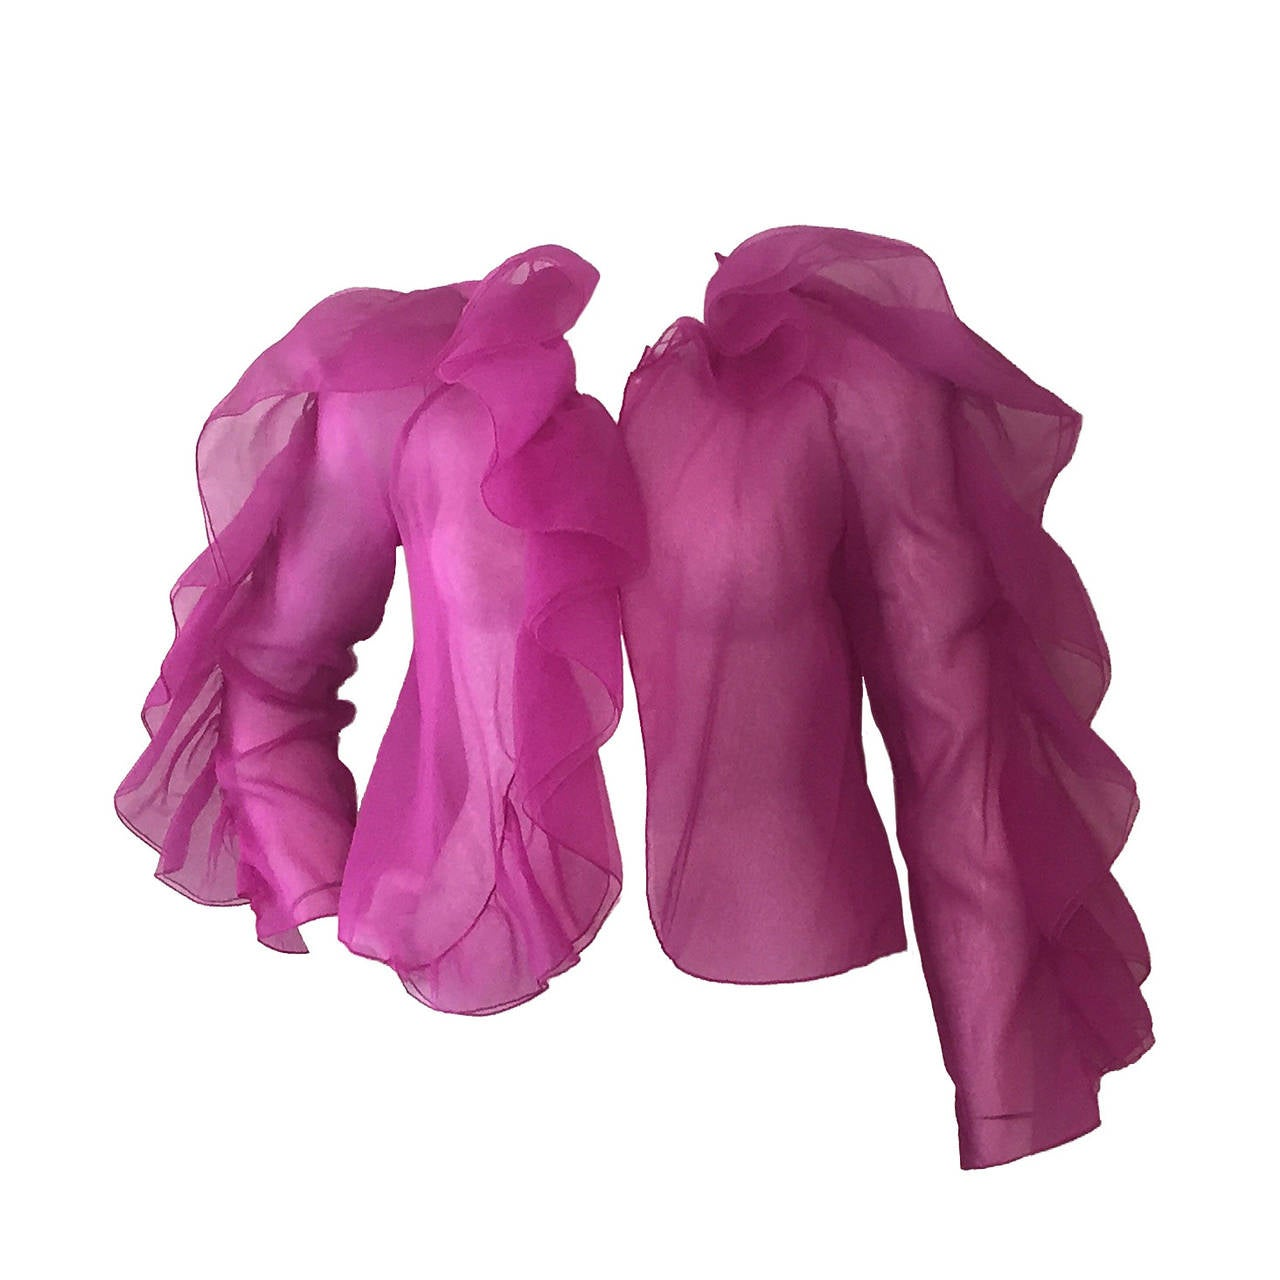 1980s Fuchsia Organza Ruffled-Sleeve Blouse 1